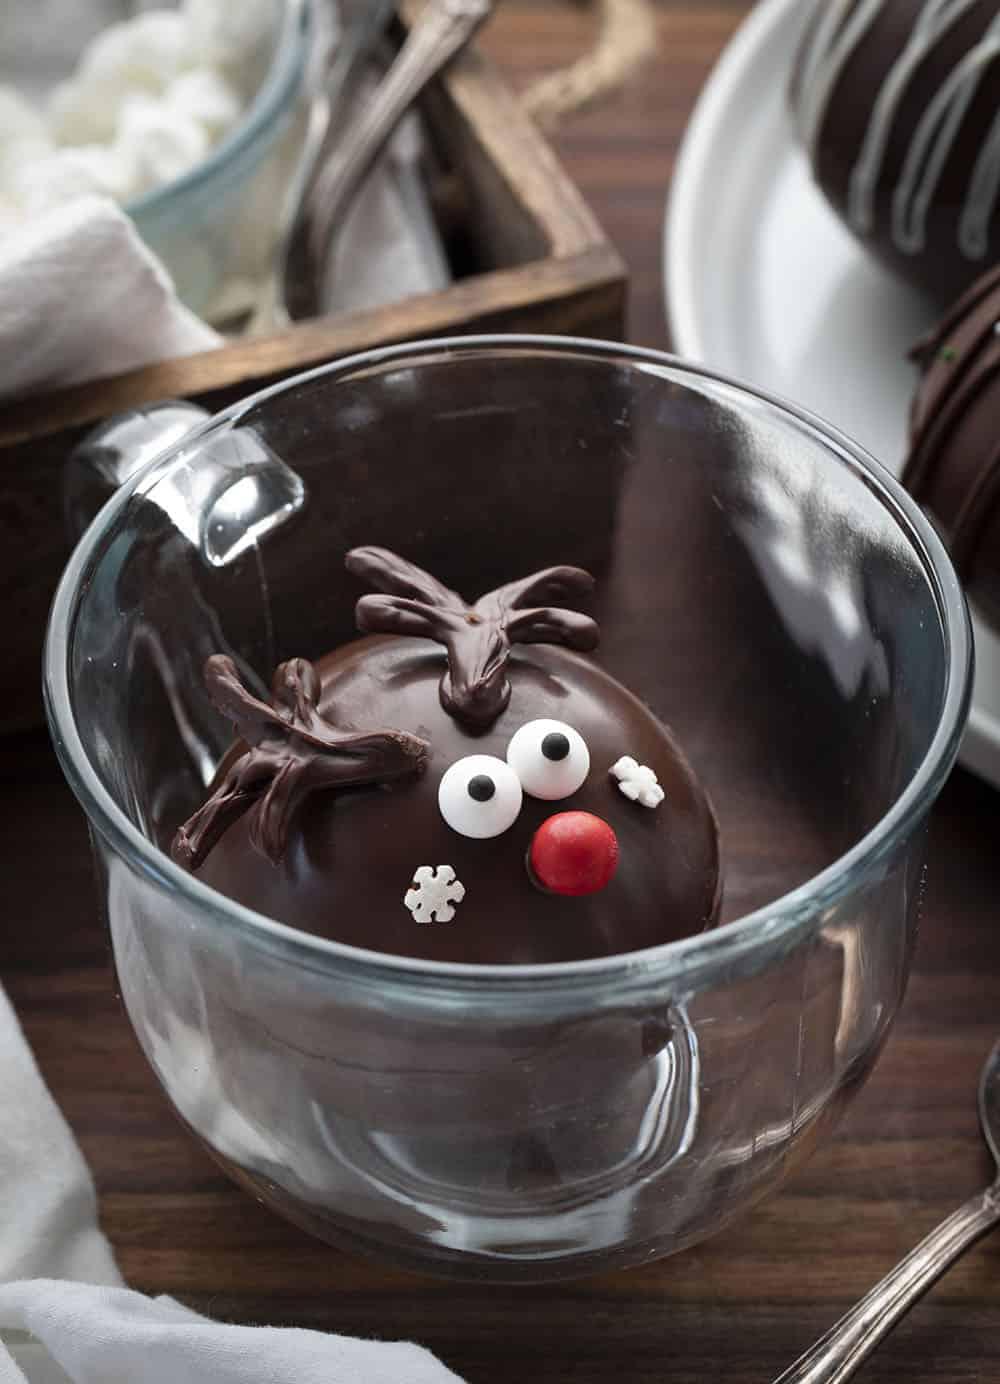 Rudolf Hot Chocolate Bomb in Mug